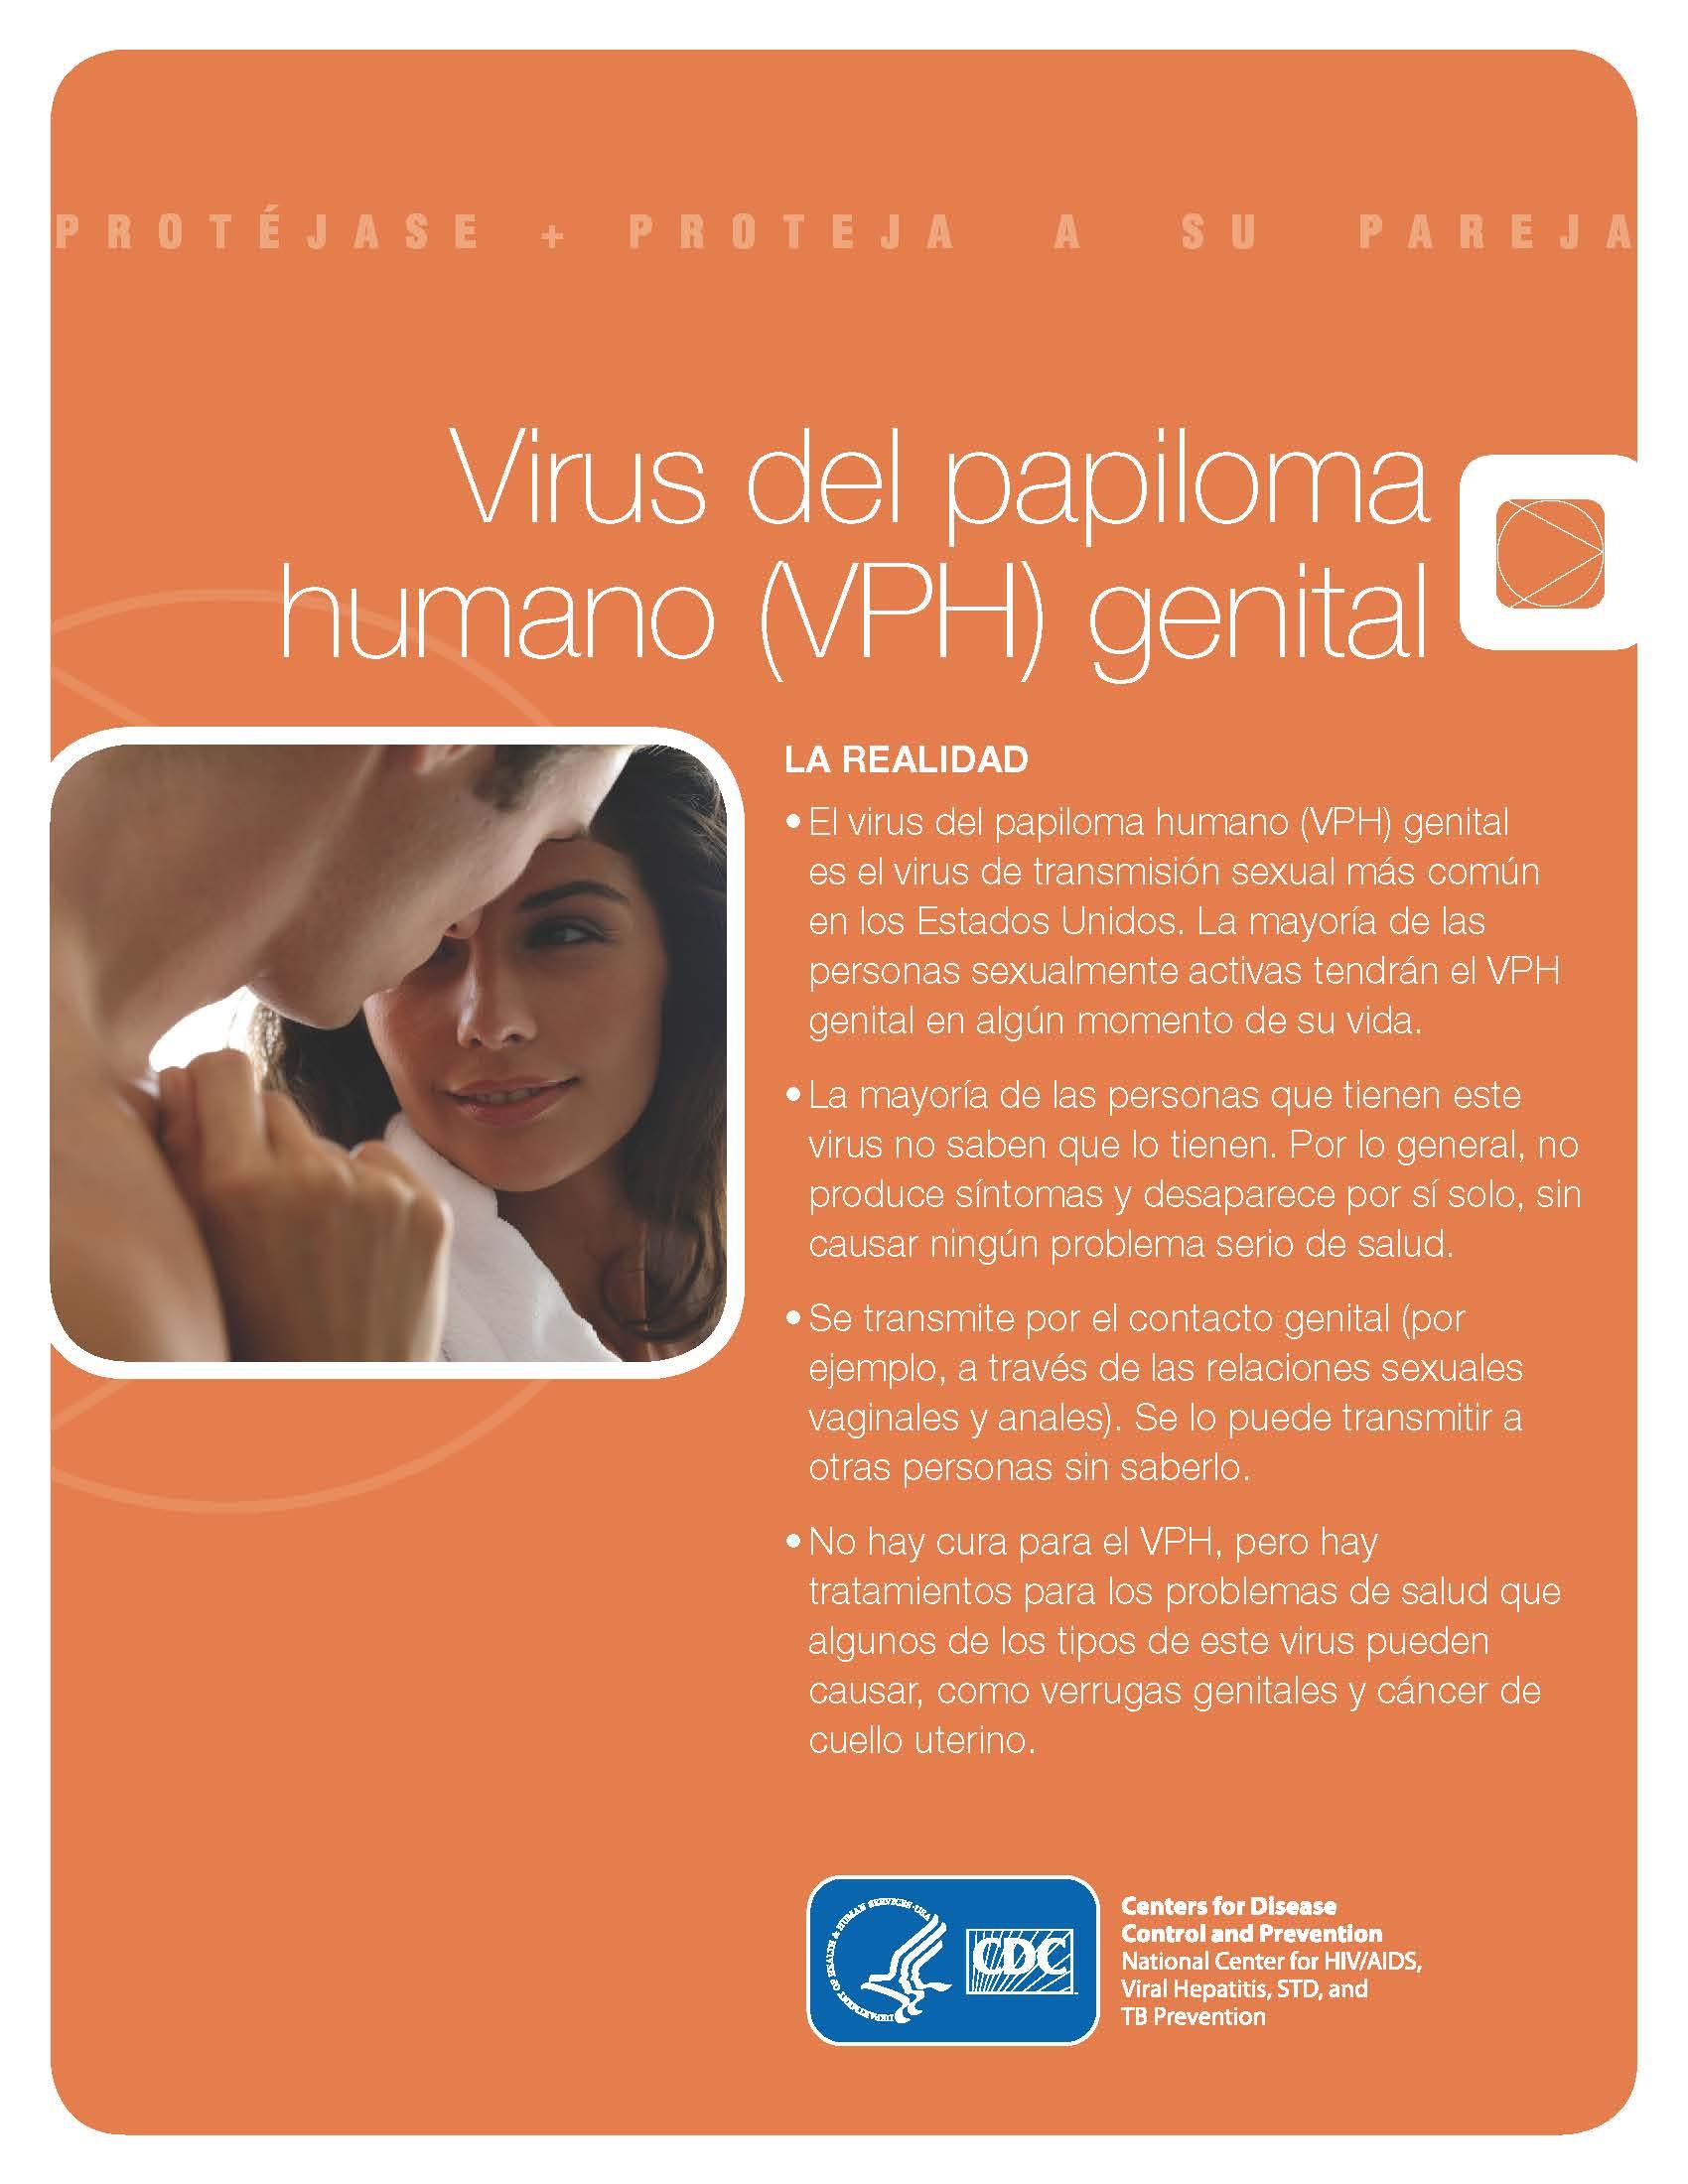 el virus del papiloma desaparece cancer endometrial mas comun